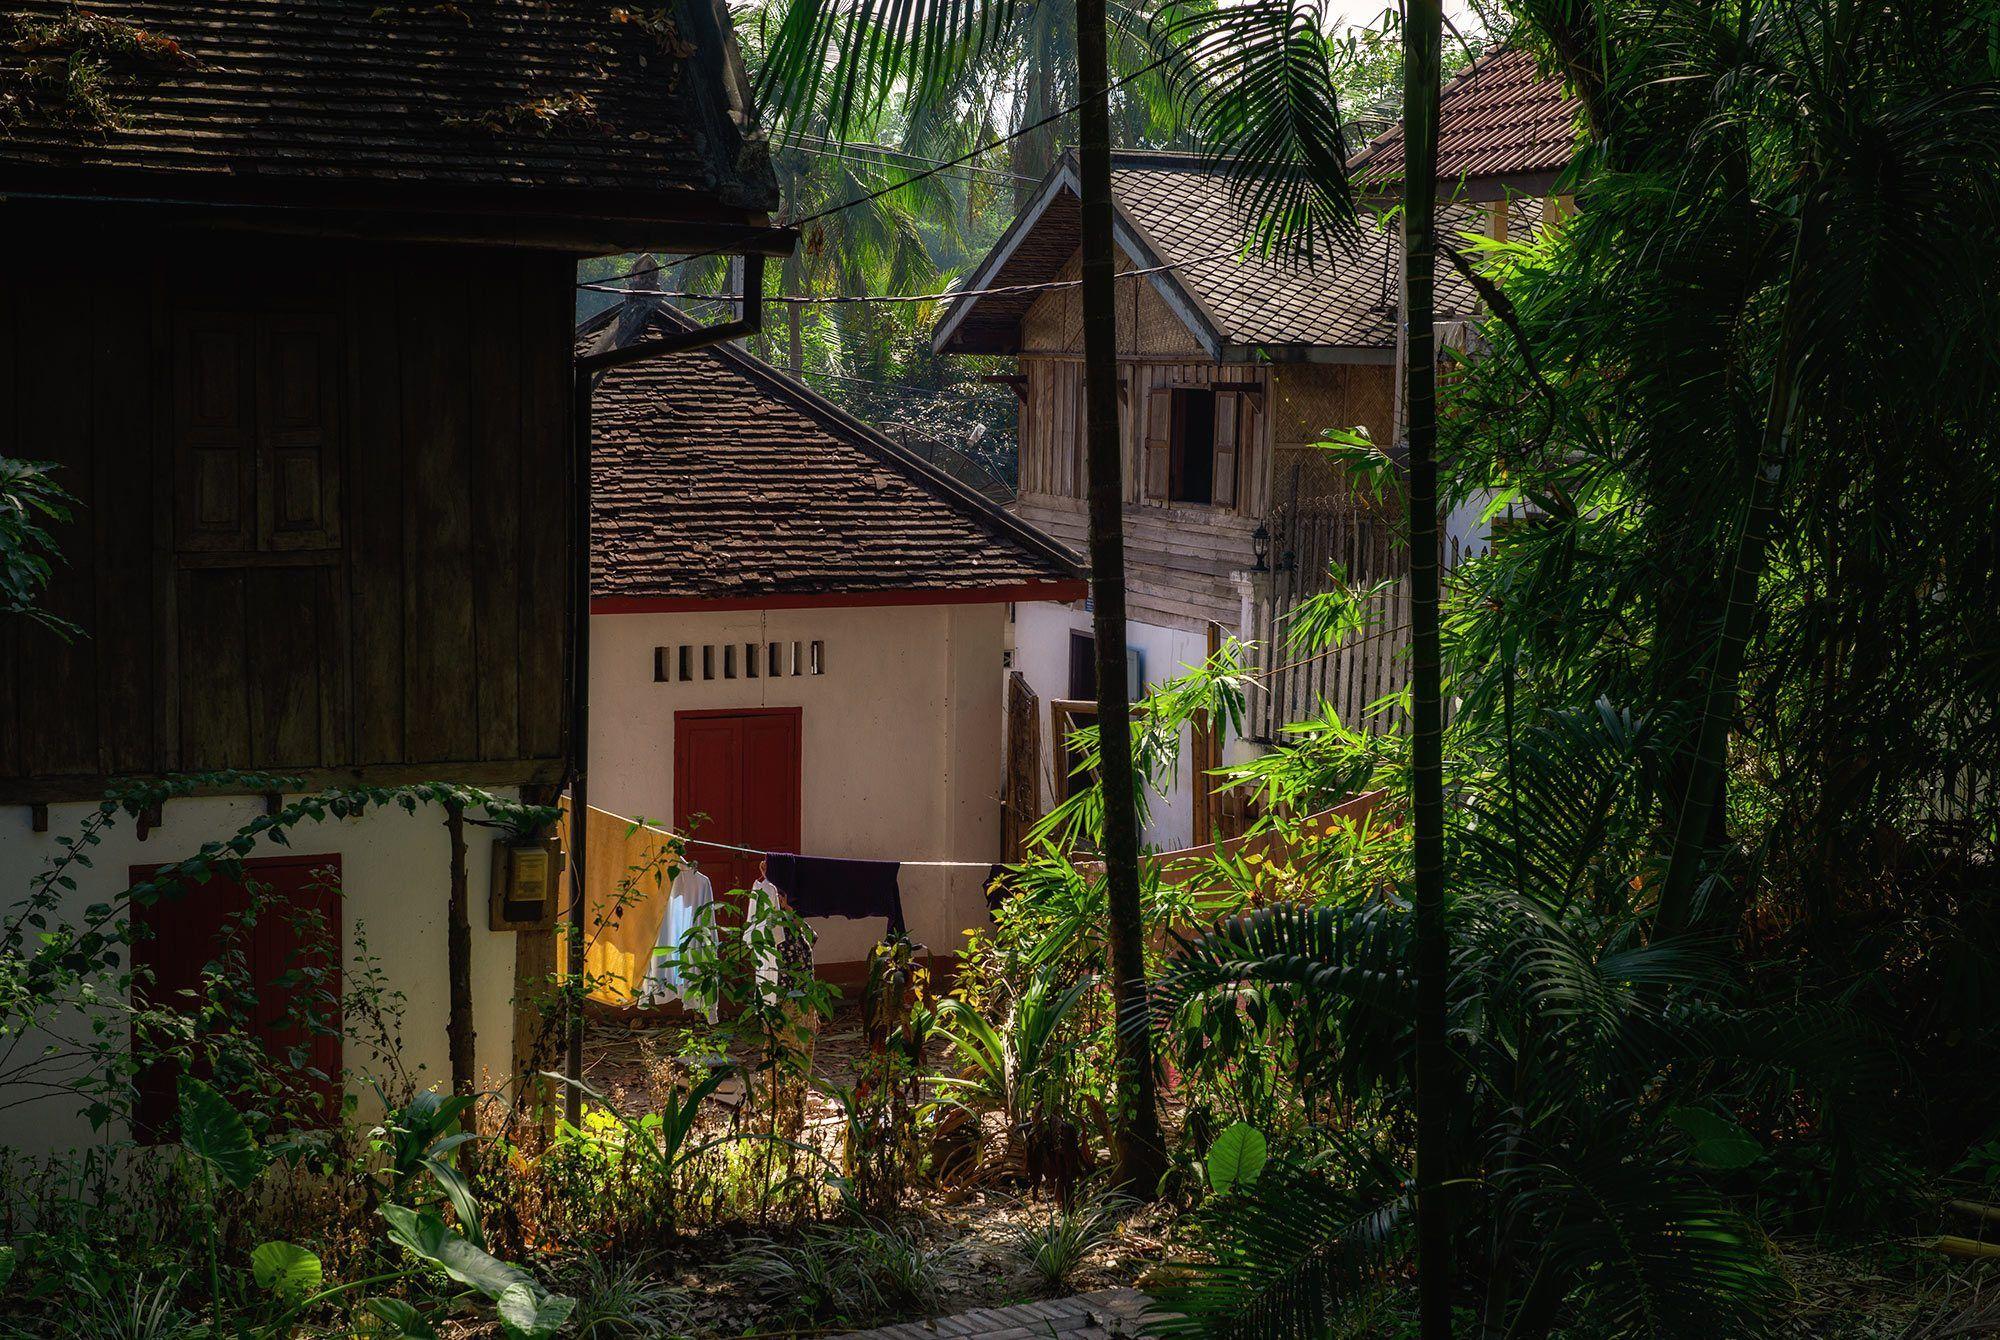 Dorfhäuser in Luang Prabang